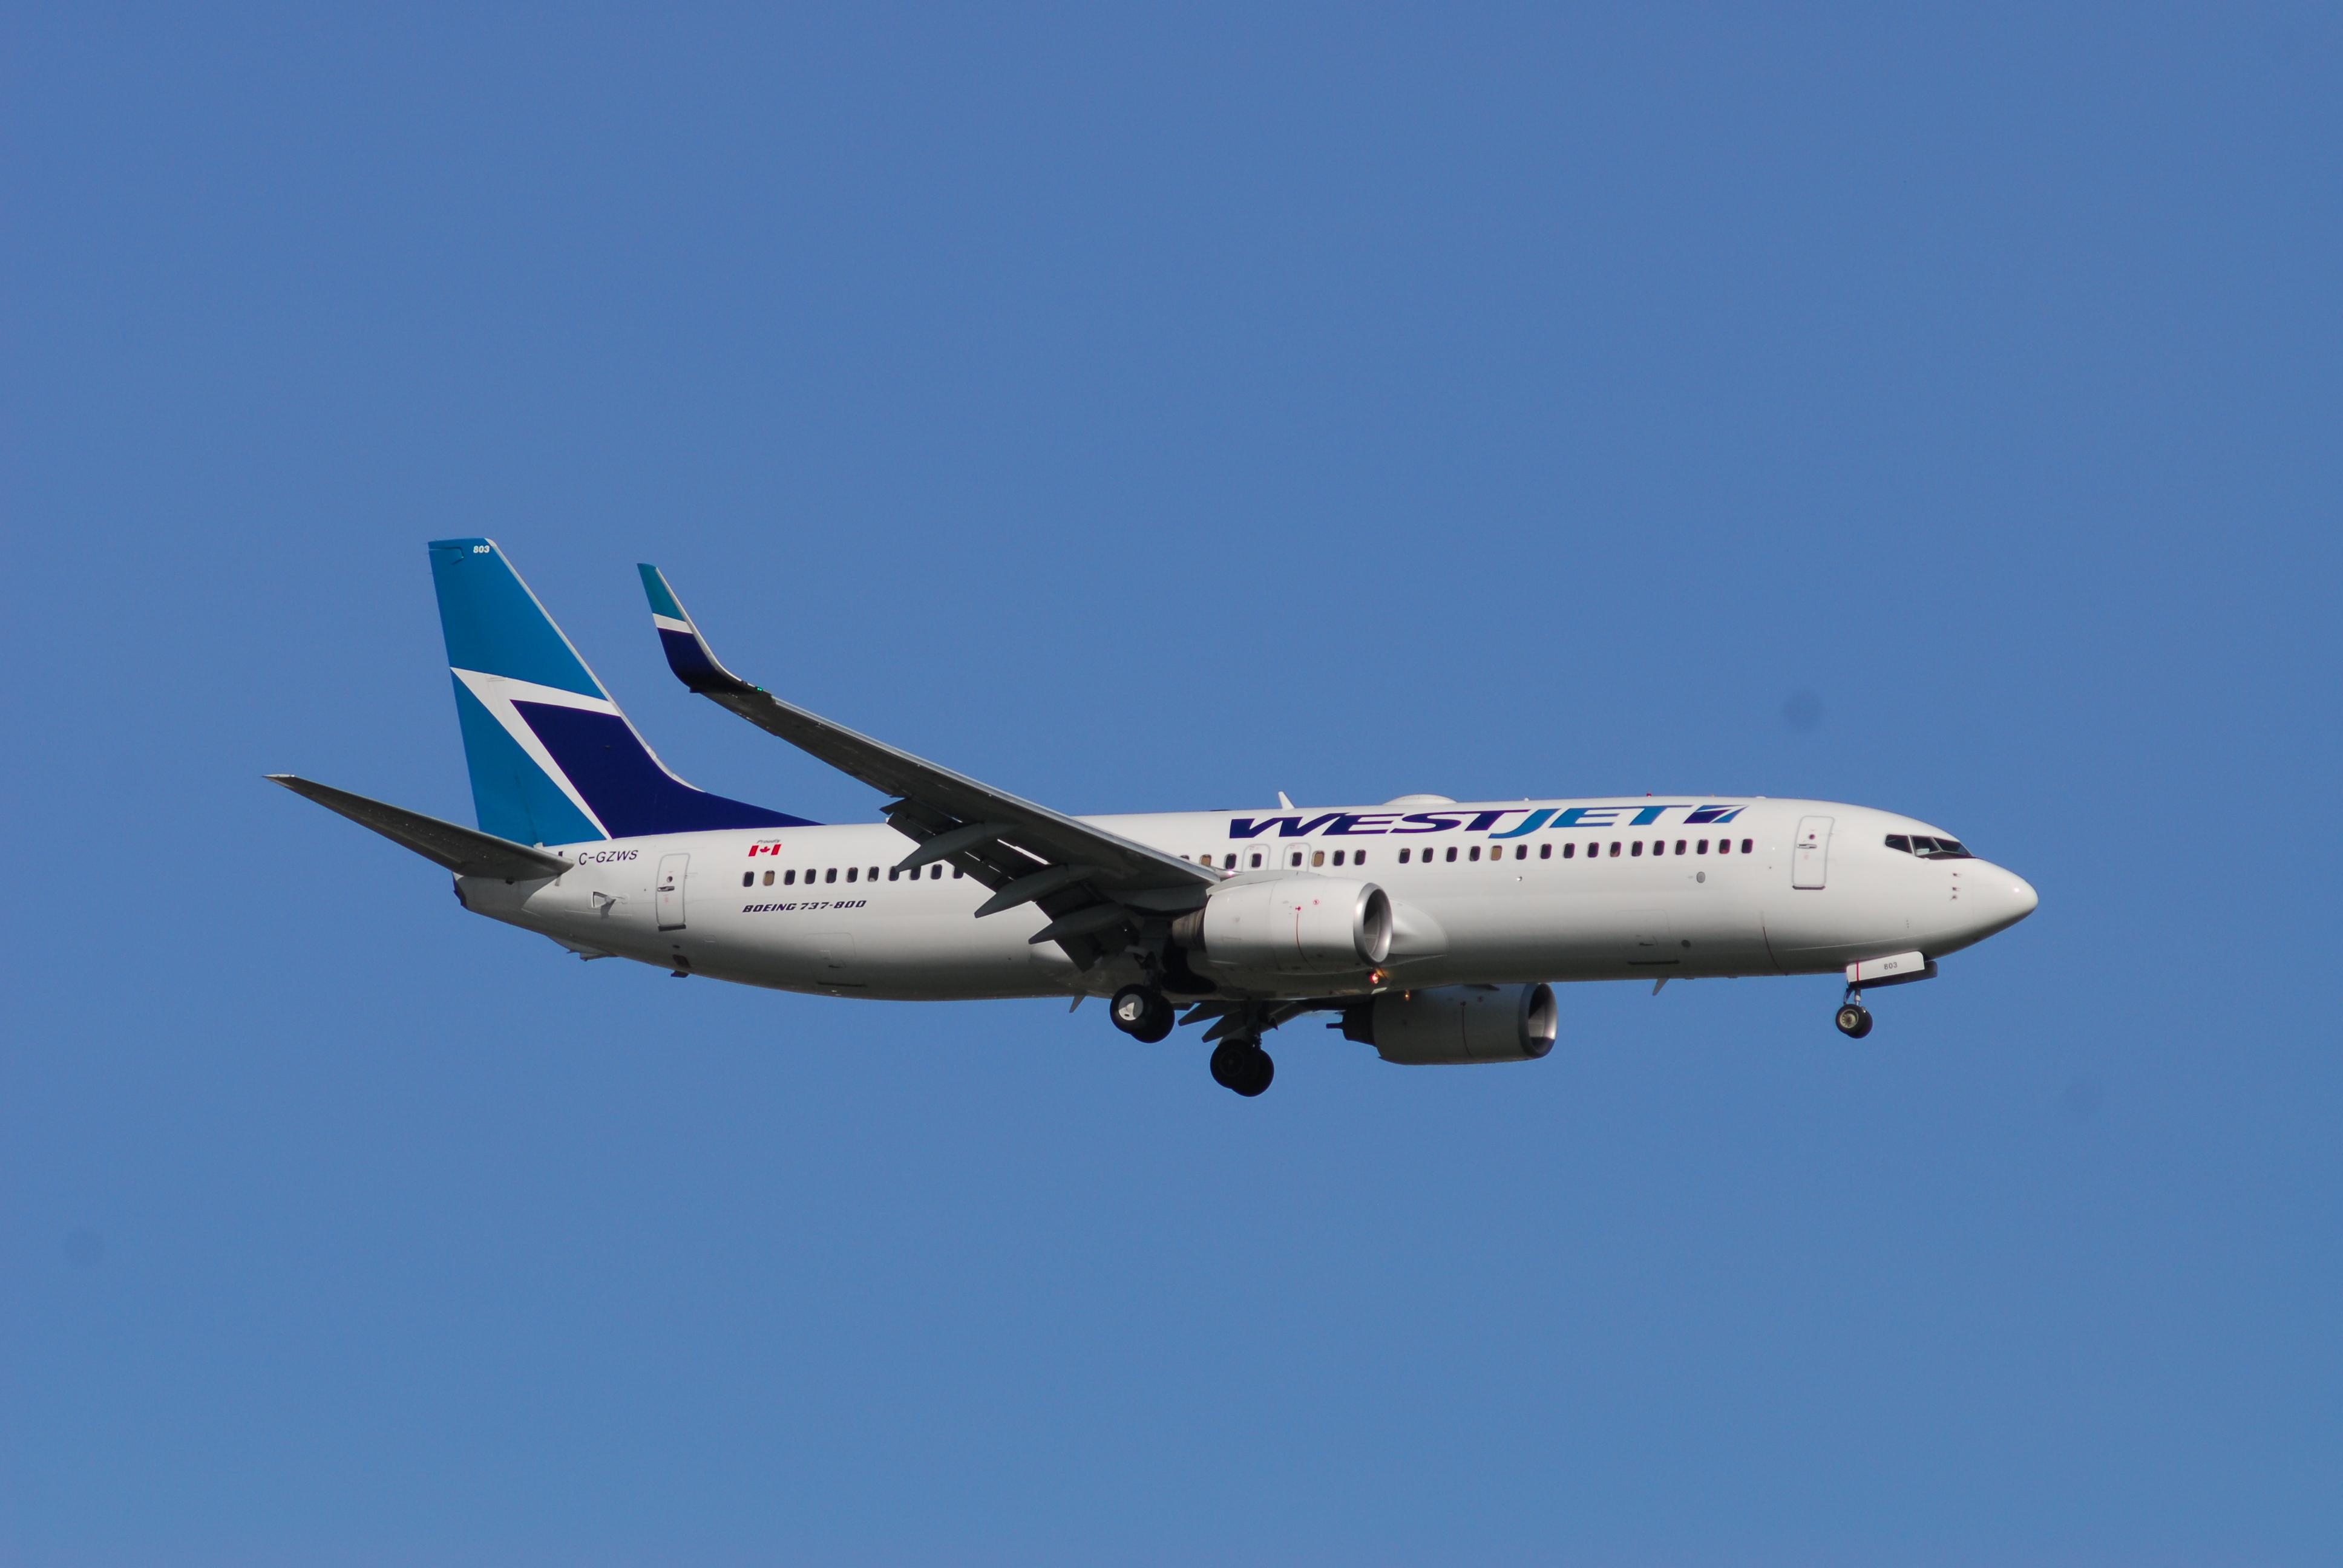 File:WestJet Boeing 737-8CT - C-GZWS - 803 - Flight WS1233